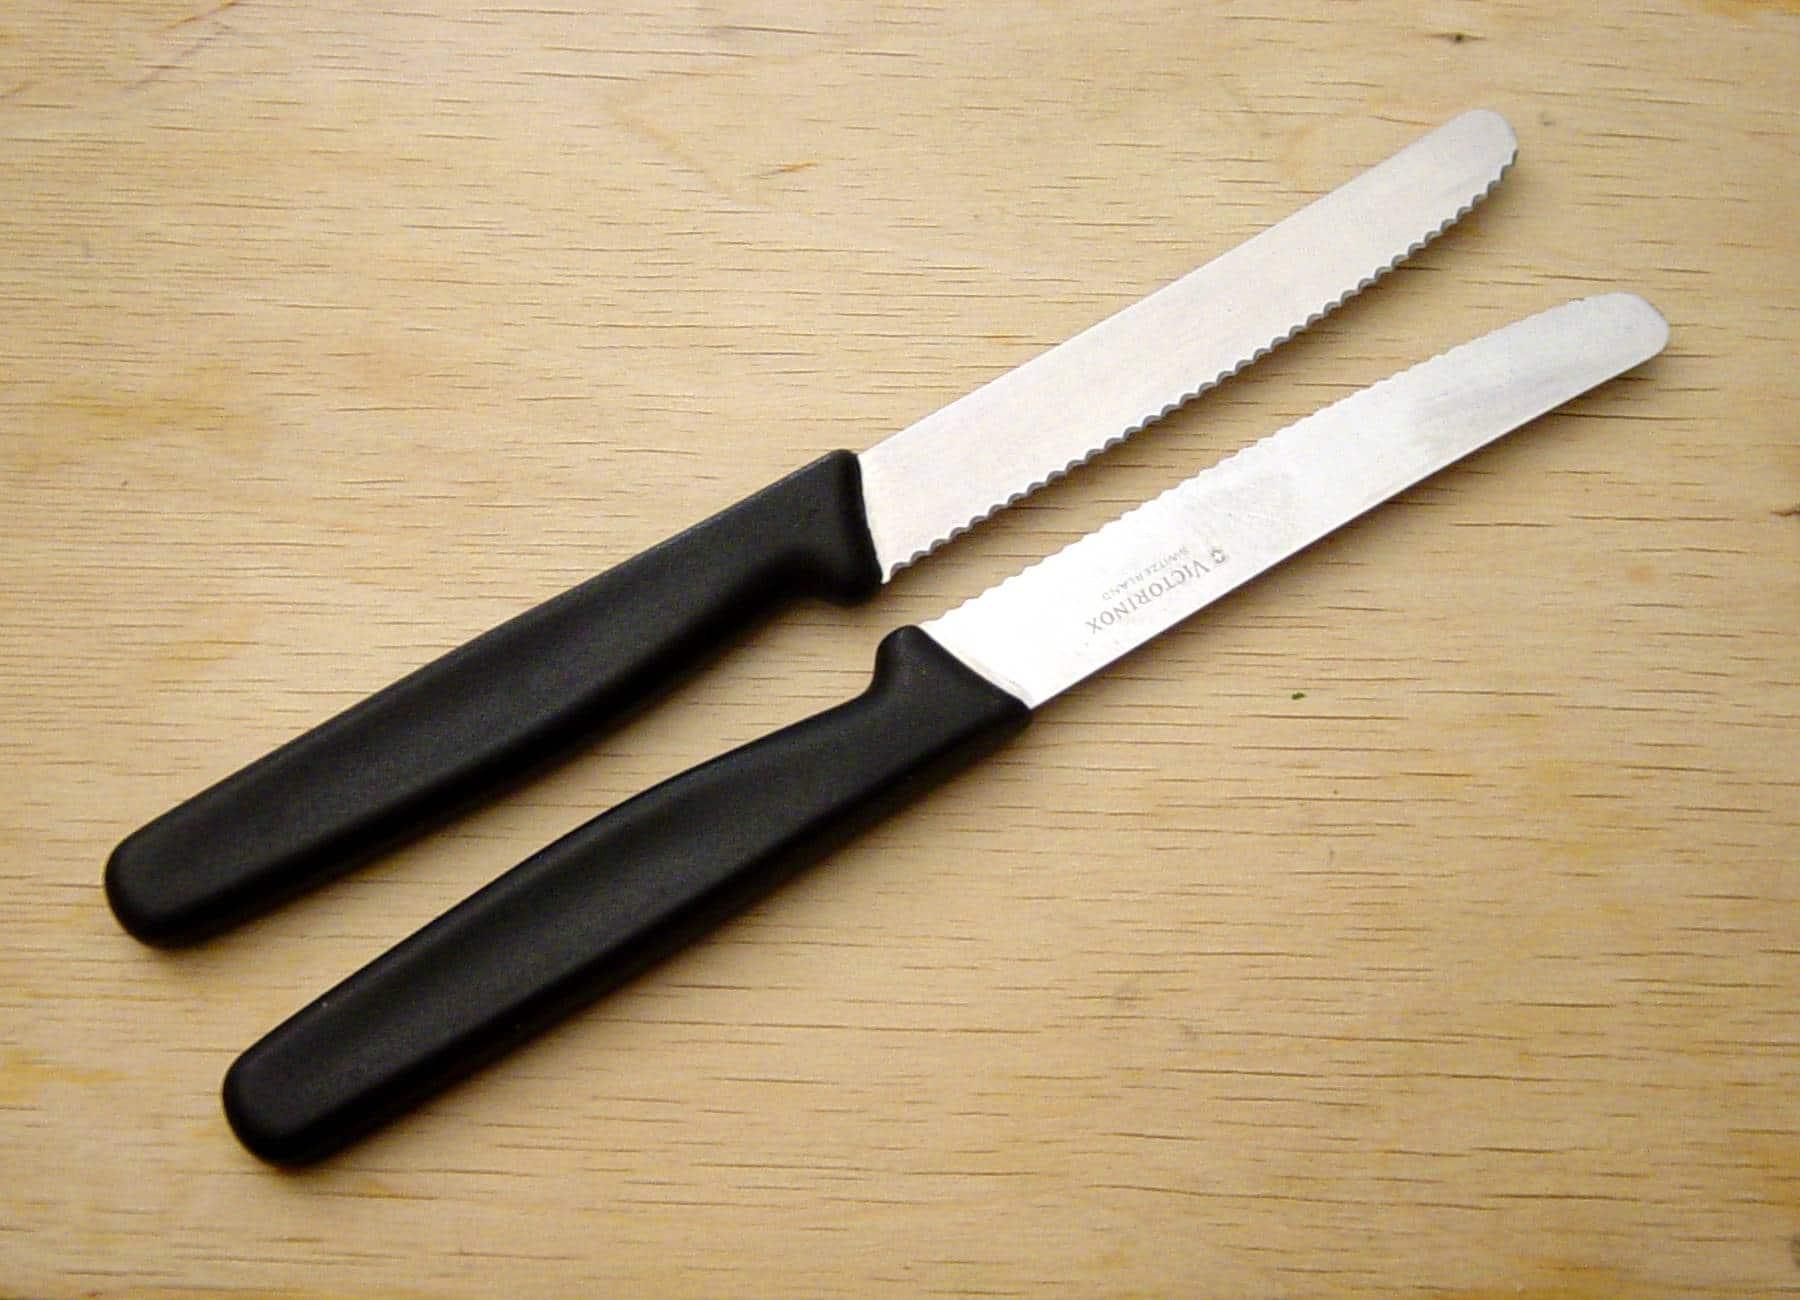 victorinox swiss army cutlery, victorinox swiss cutlery